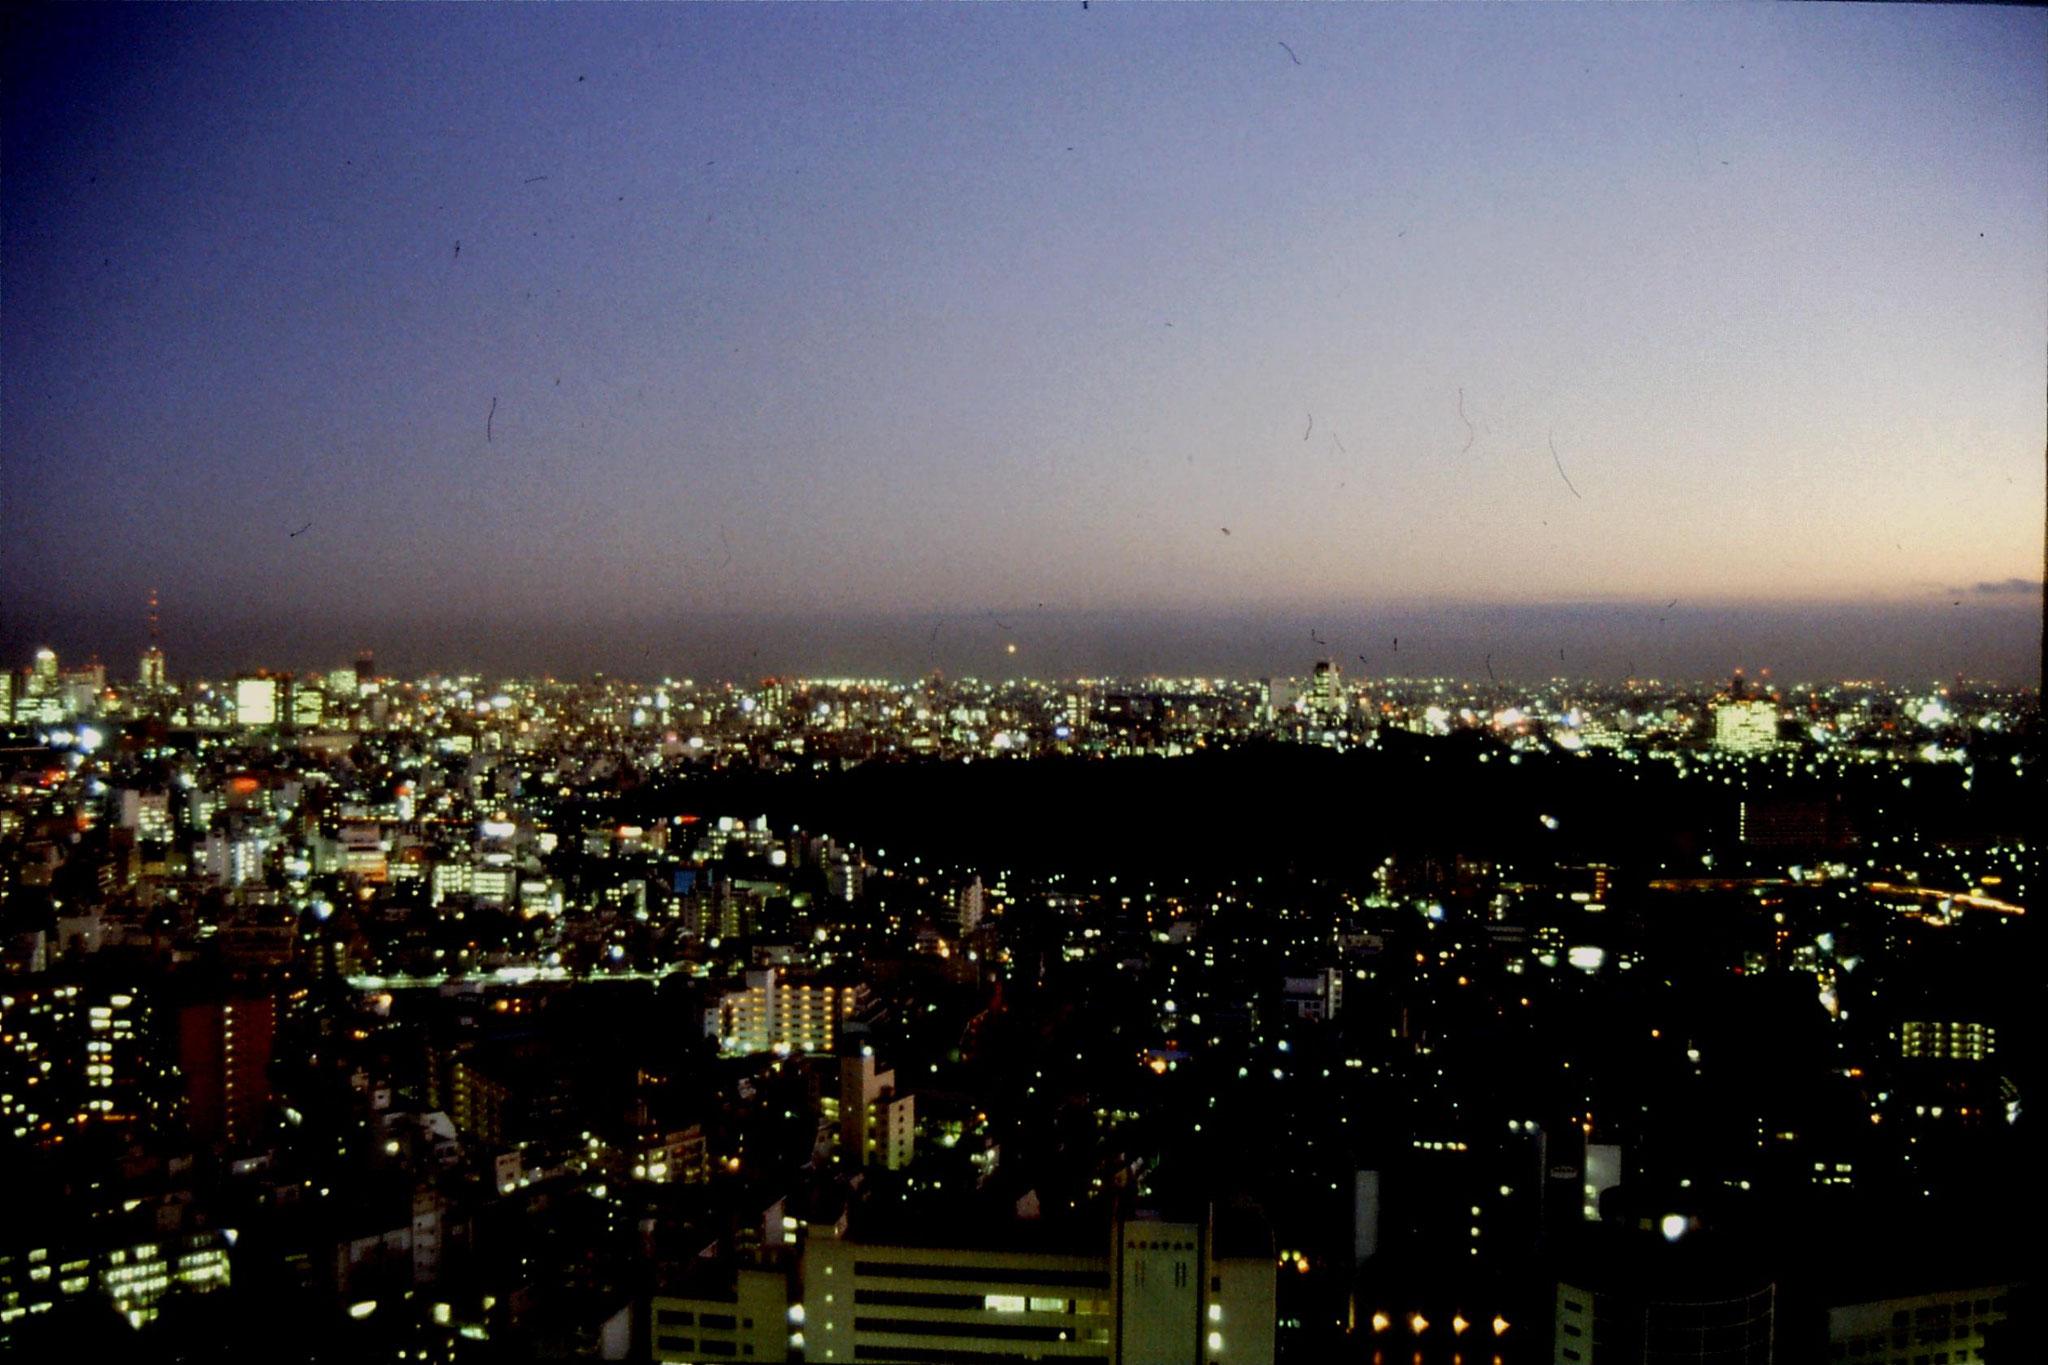 28/12/1988: 31: Tokyo